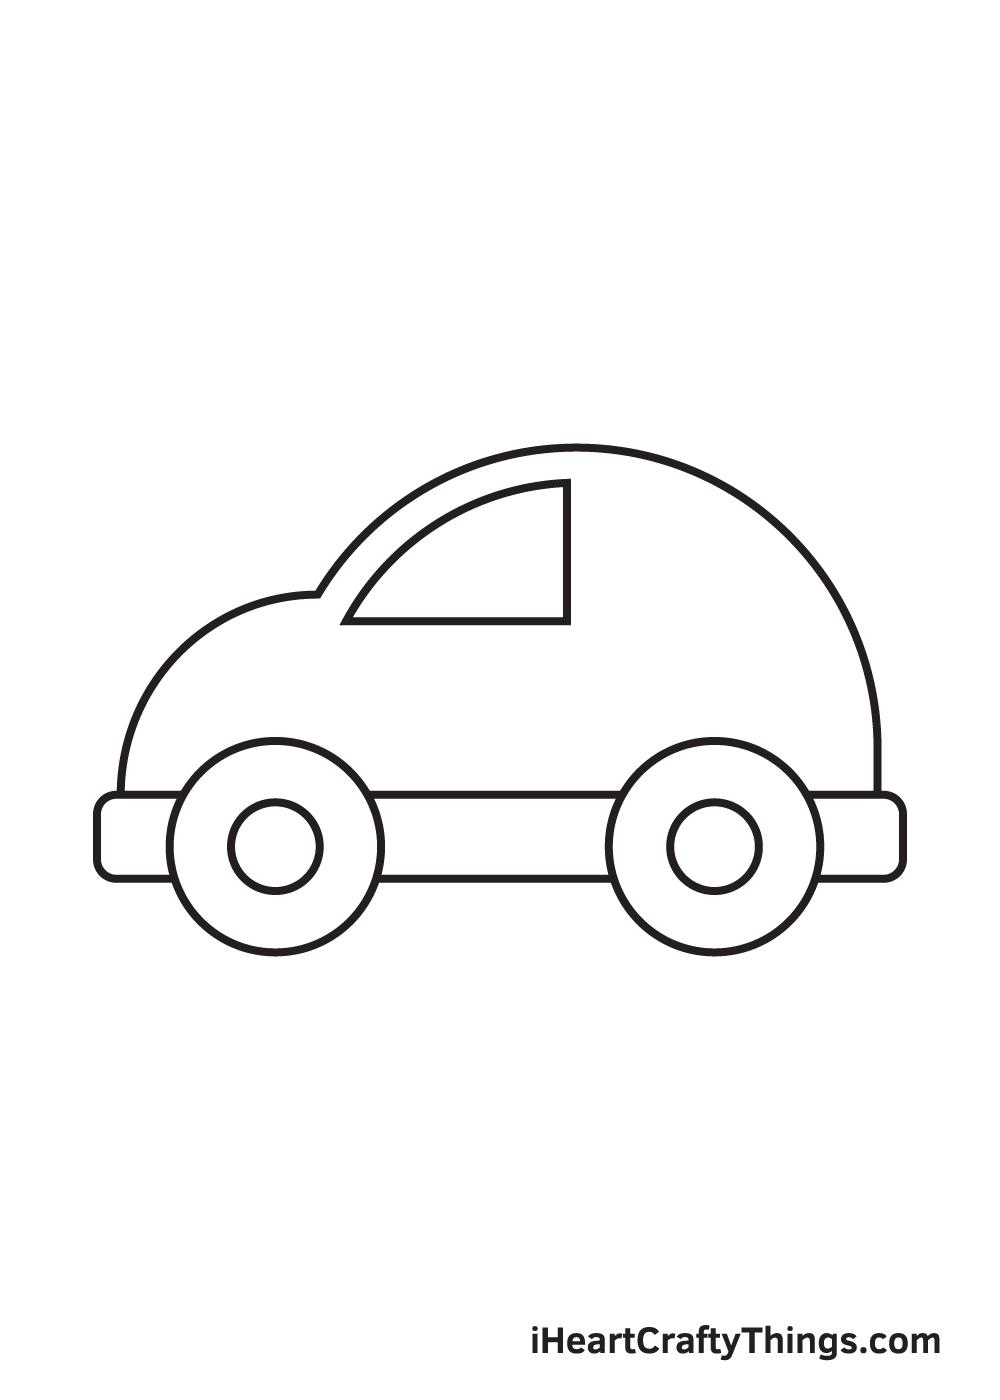 car drawing – step 5